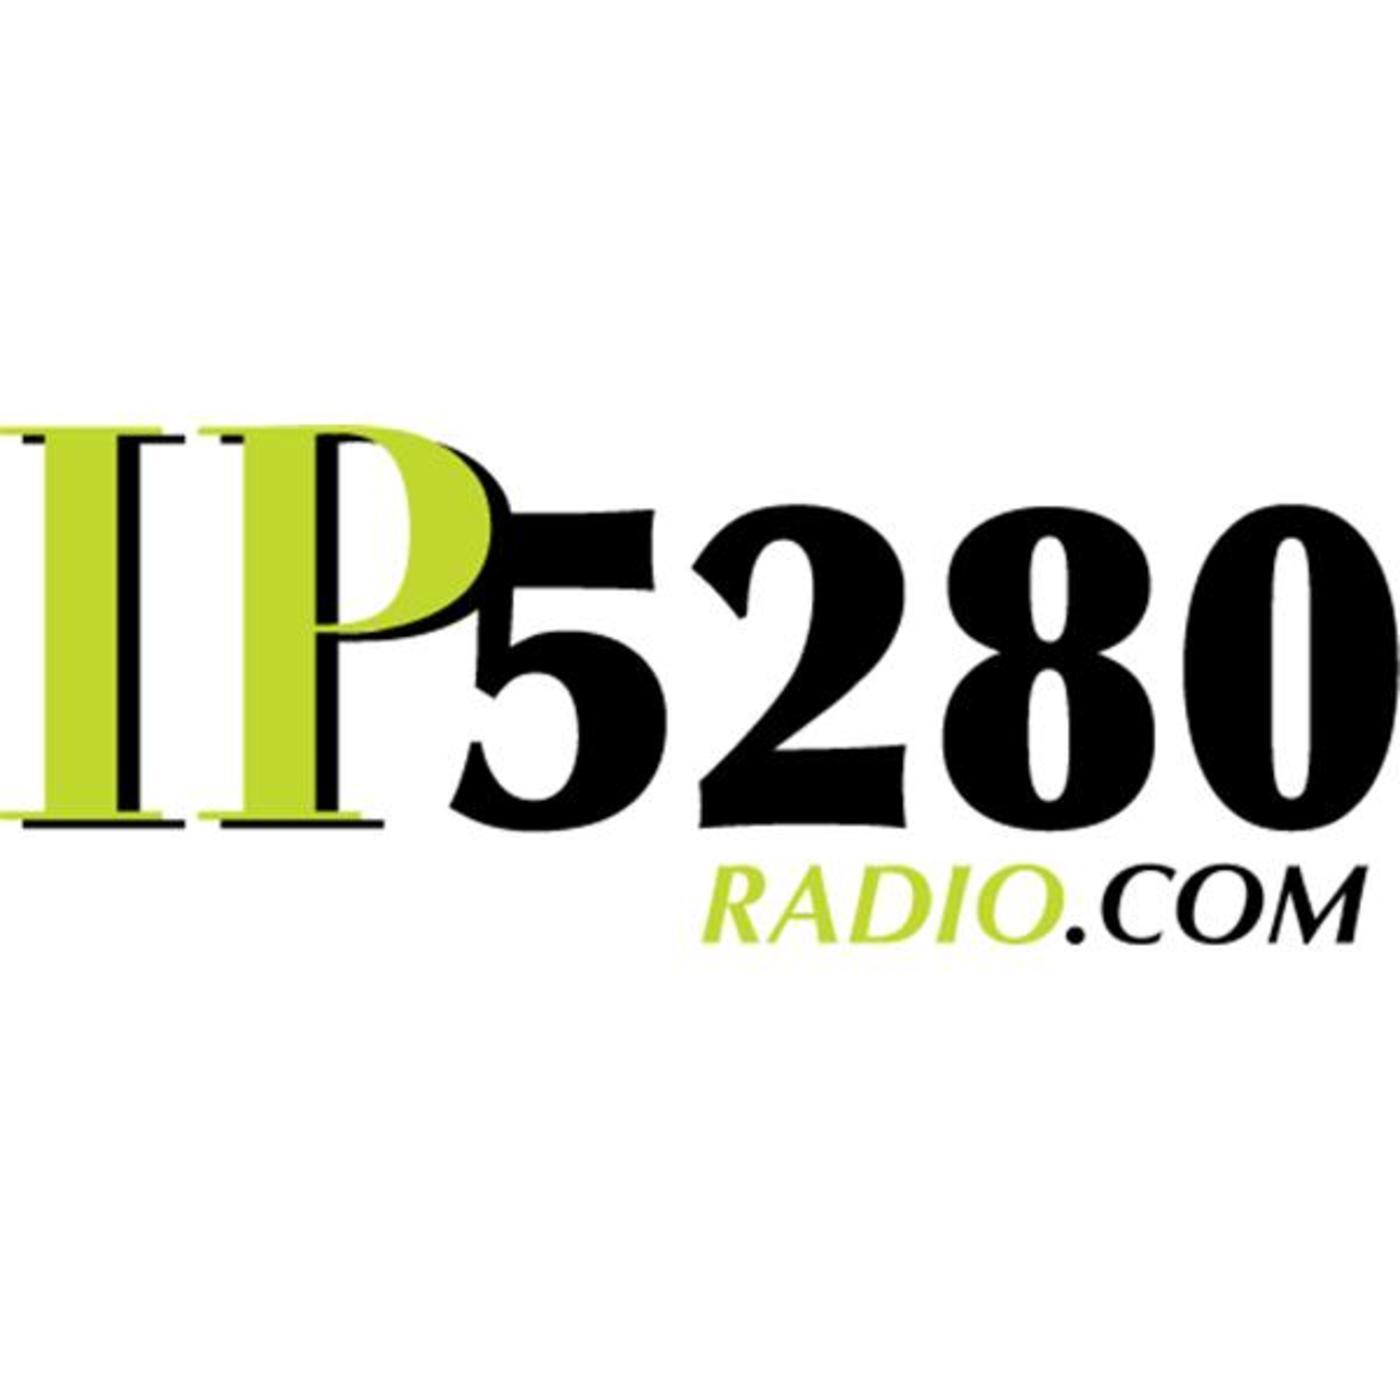 IP5280Radio.com